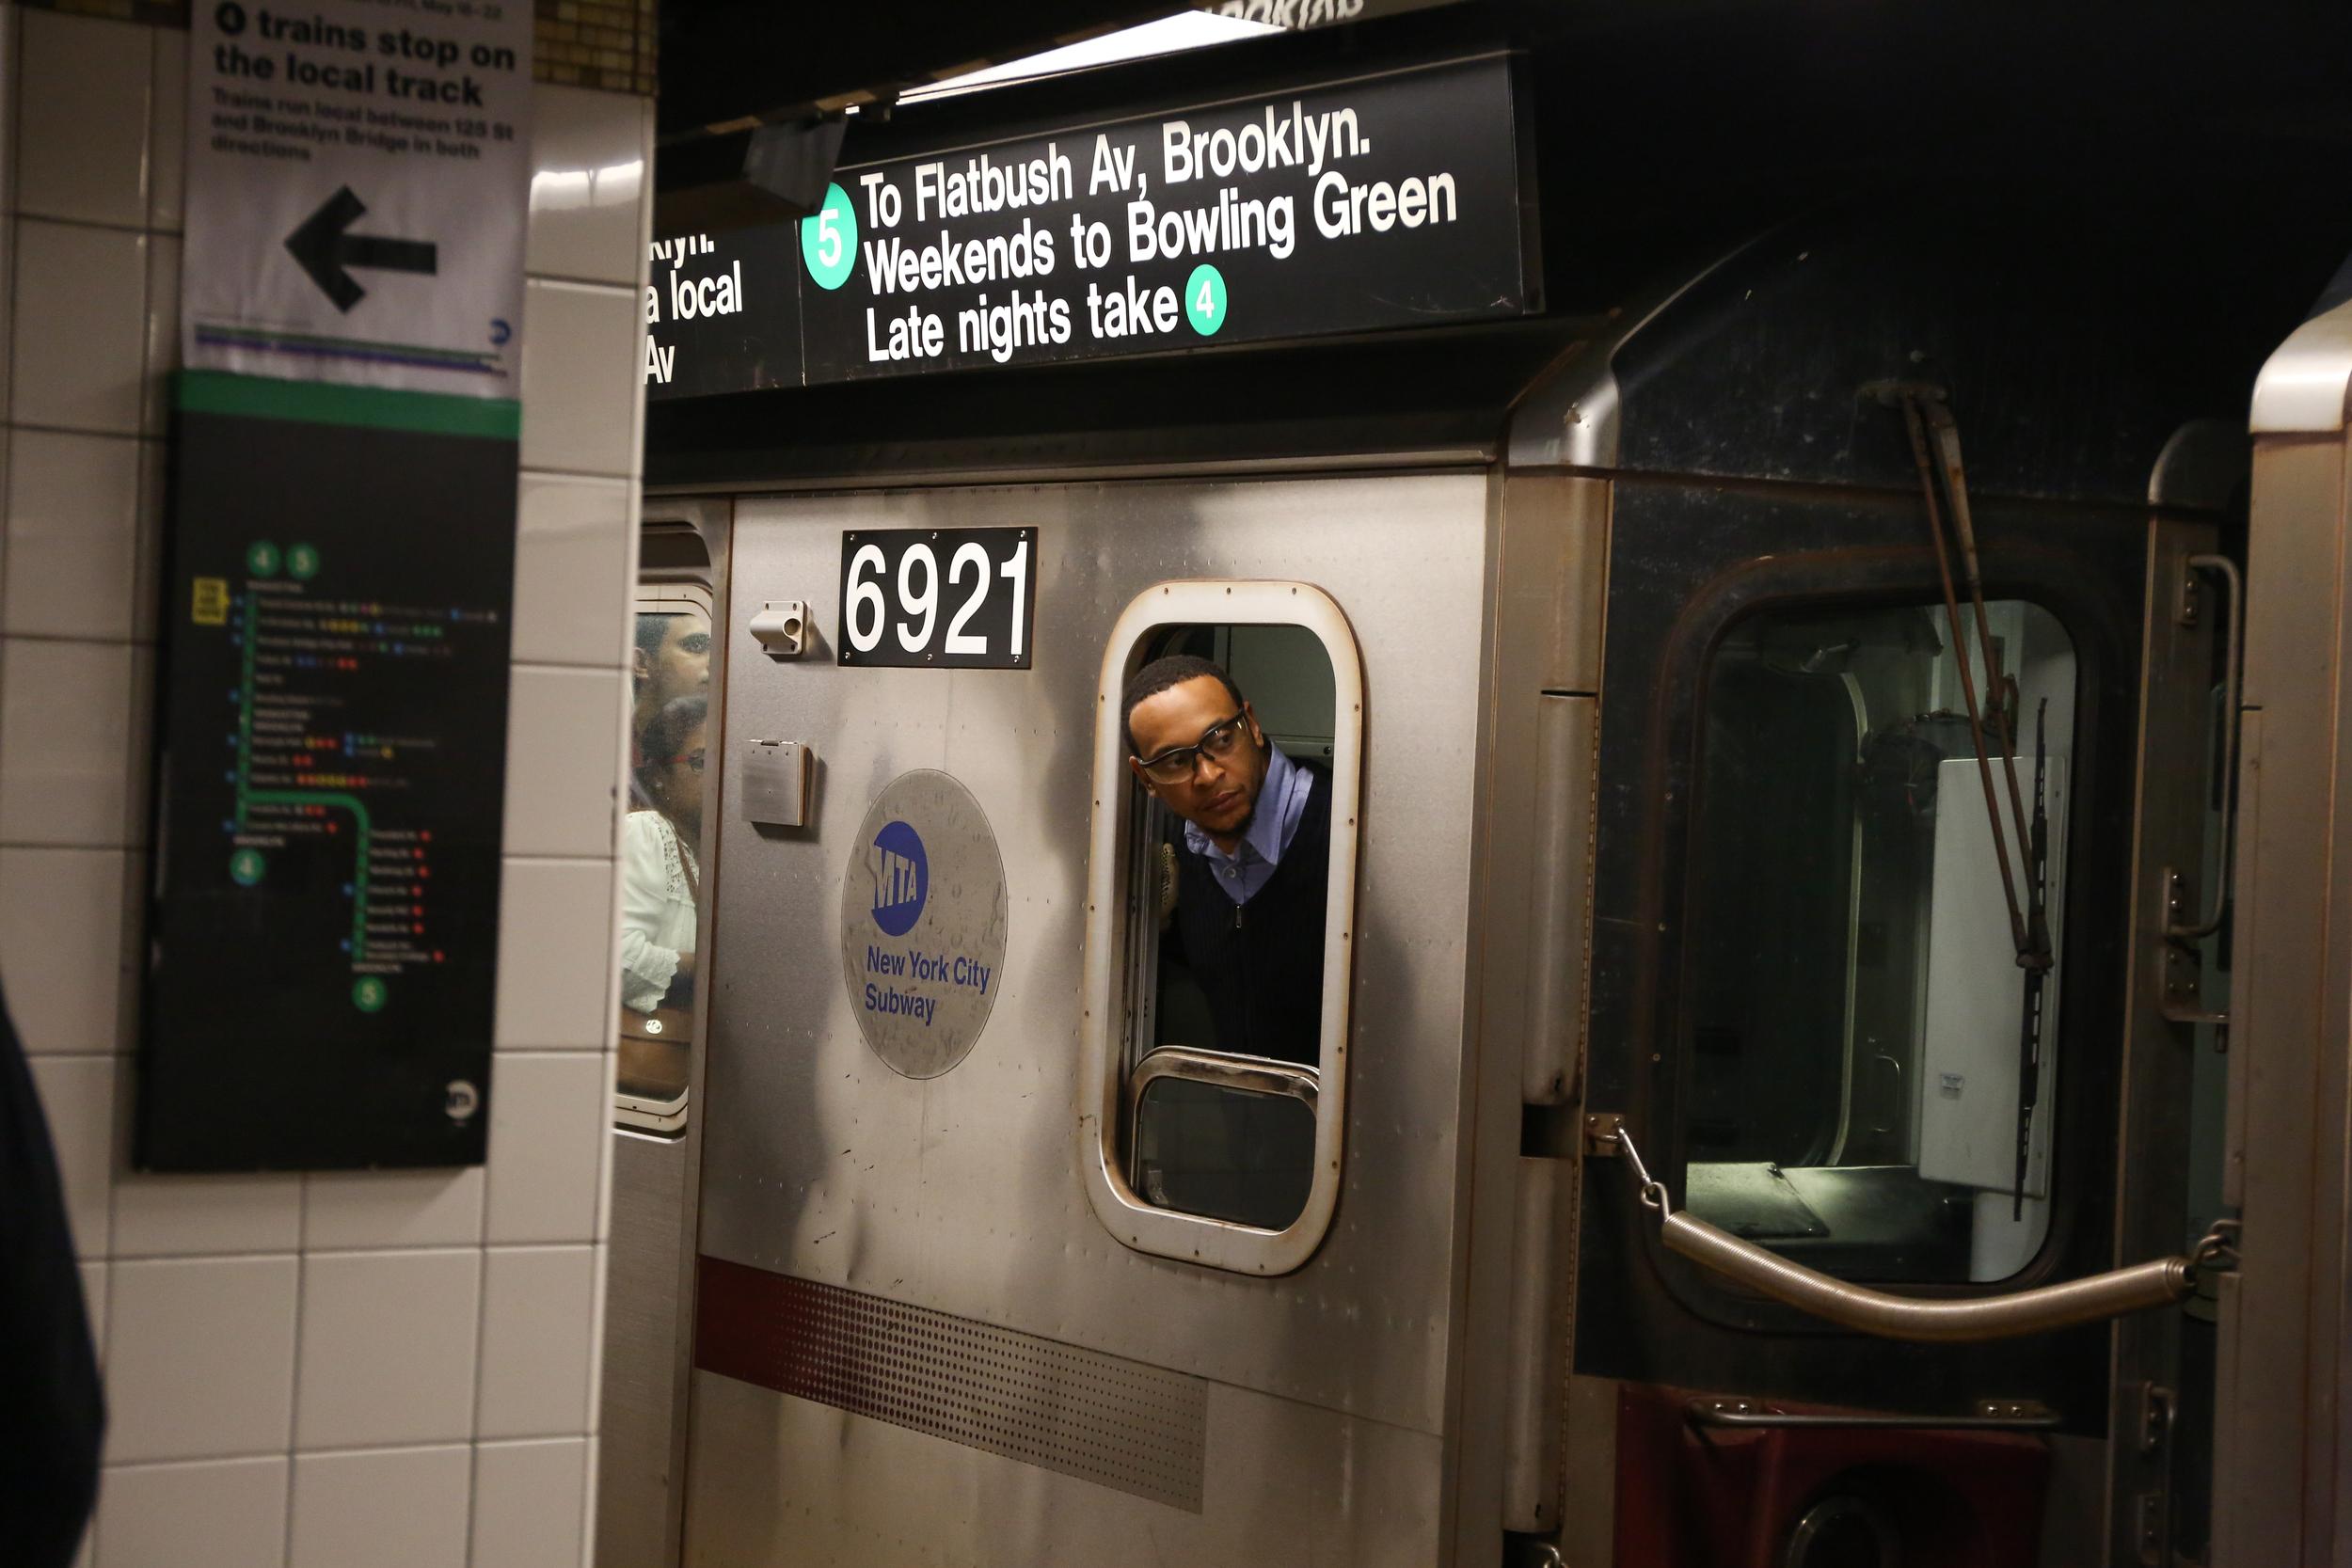 NYC2015schaeffer-65.jpg